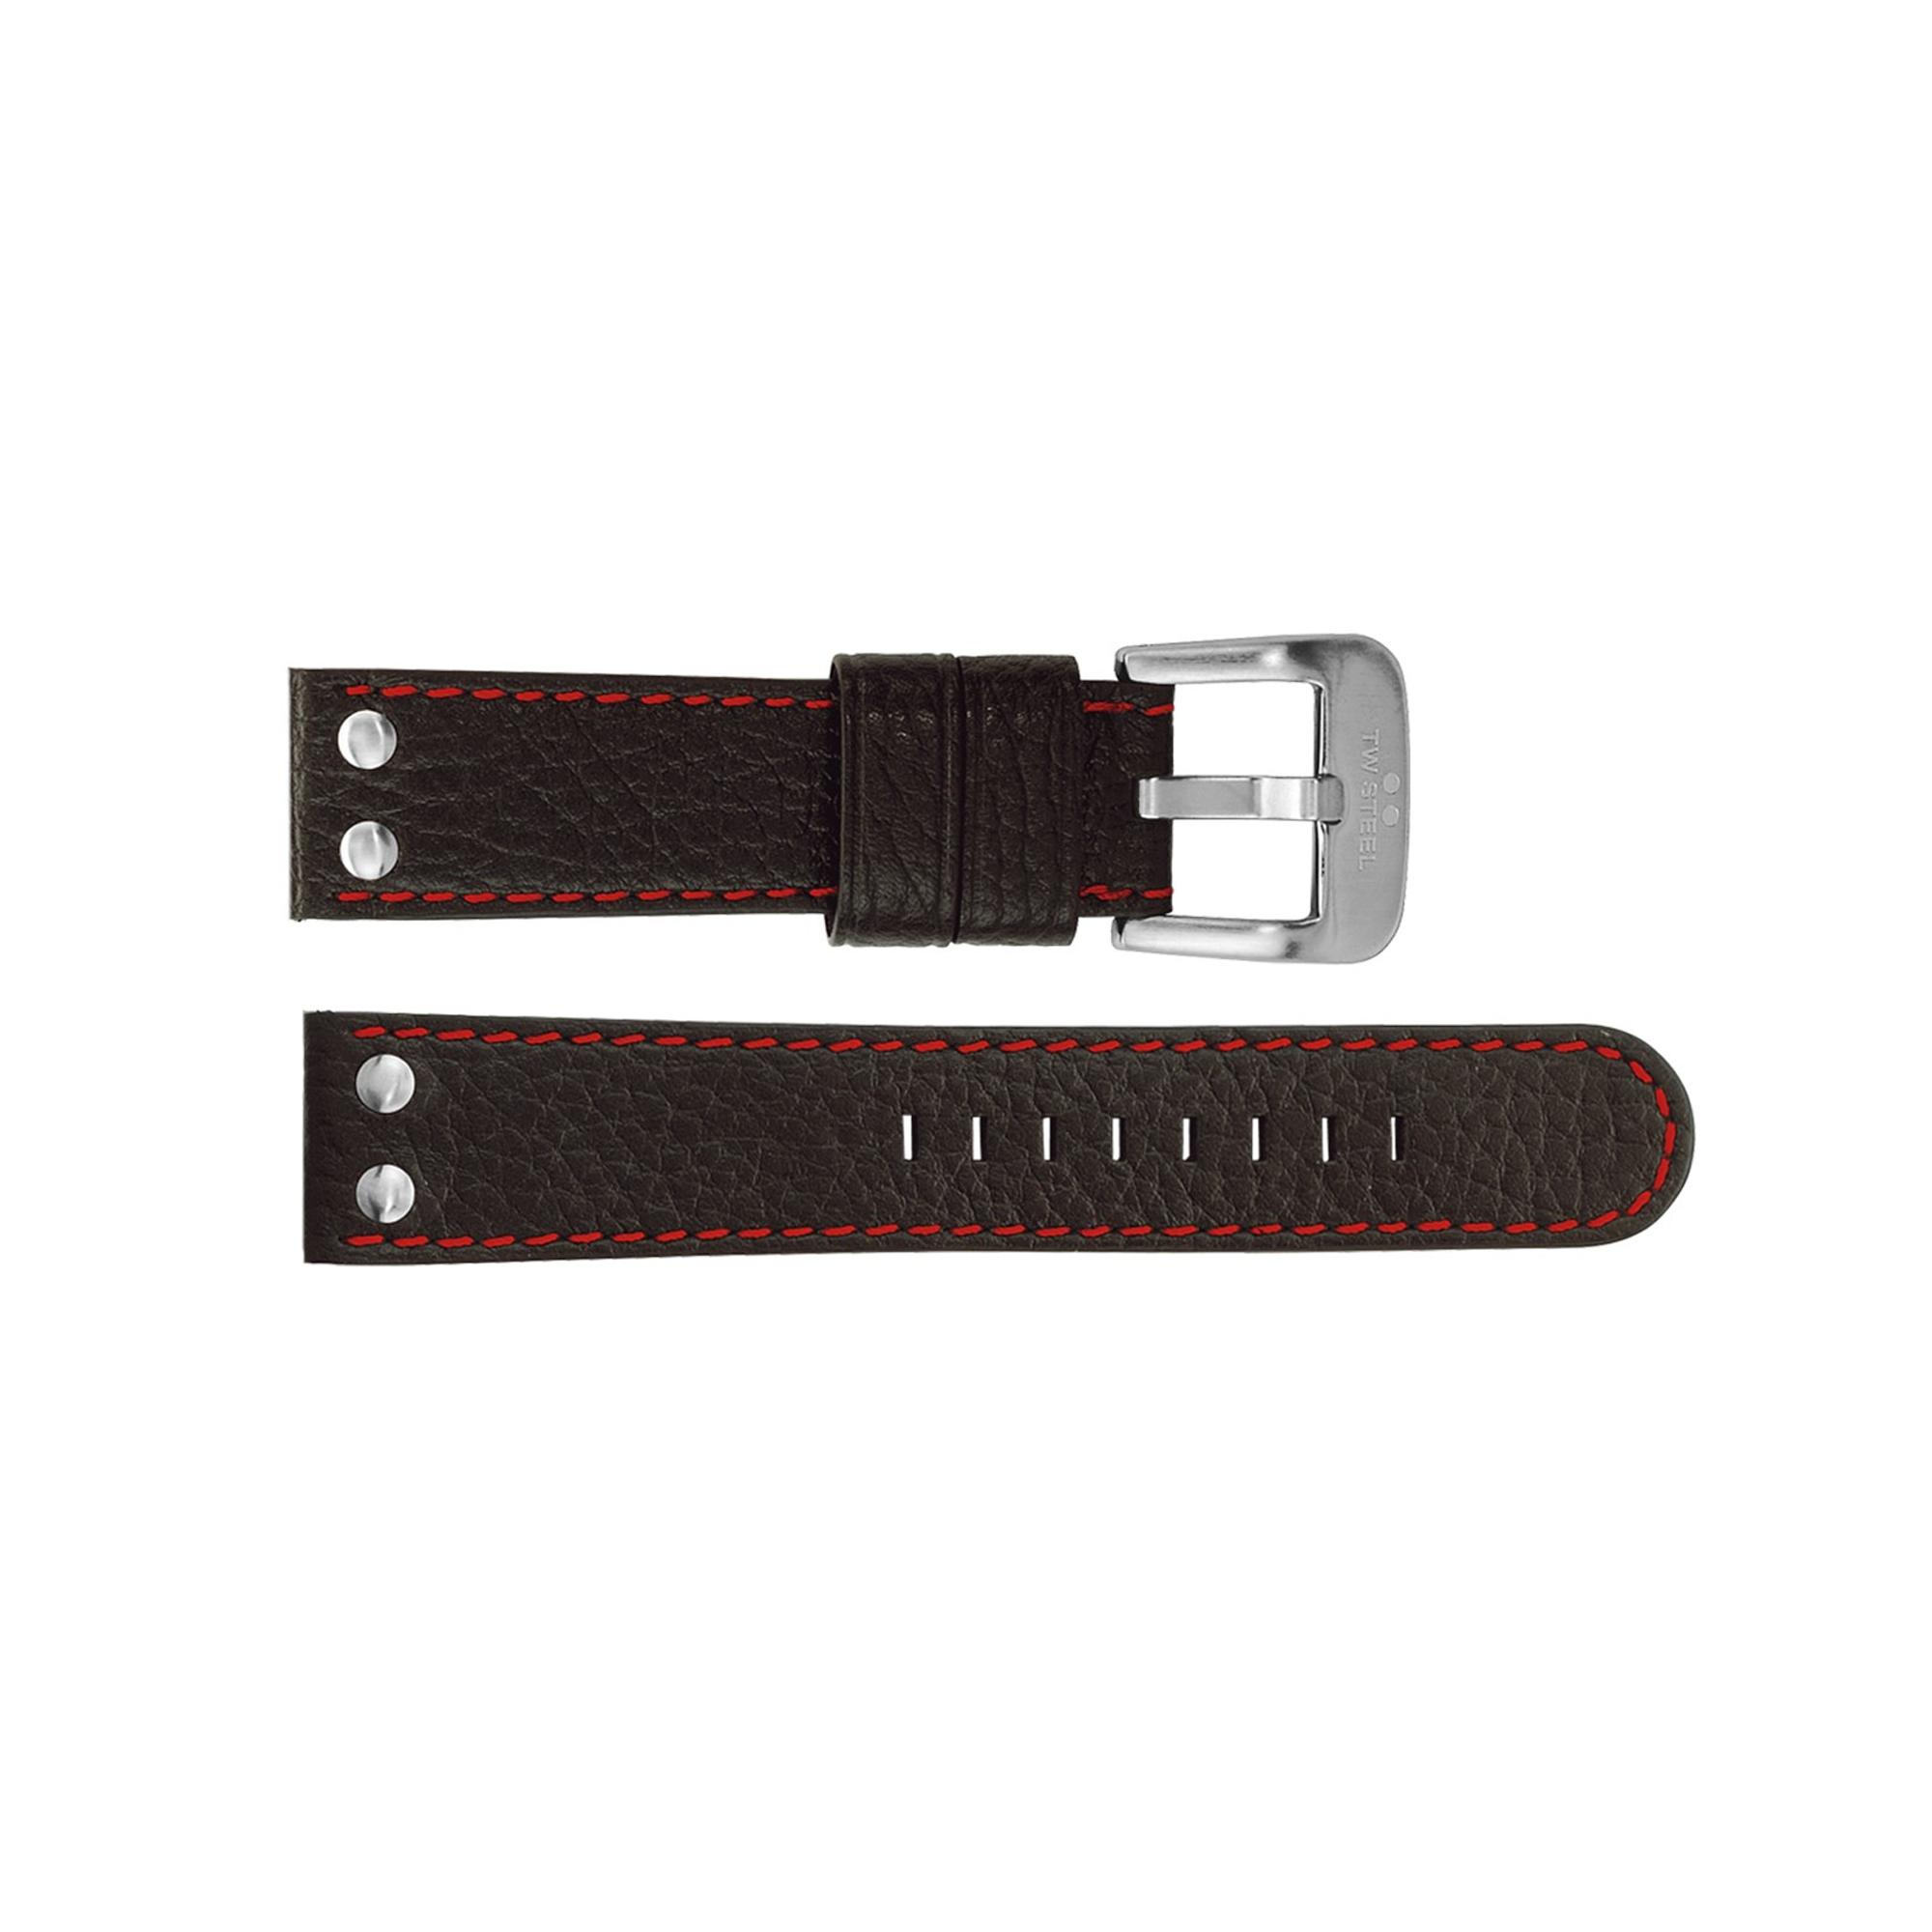 TW Steel horlogeband TWB28 Leder Zwart 22mm + rood stiksel